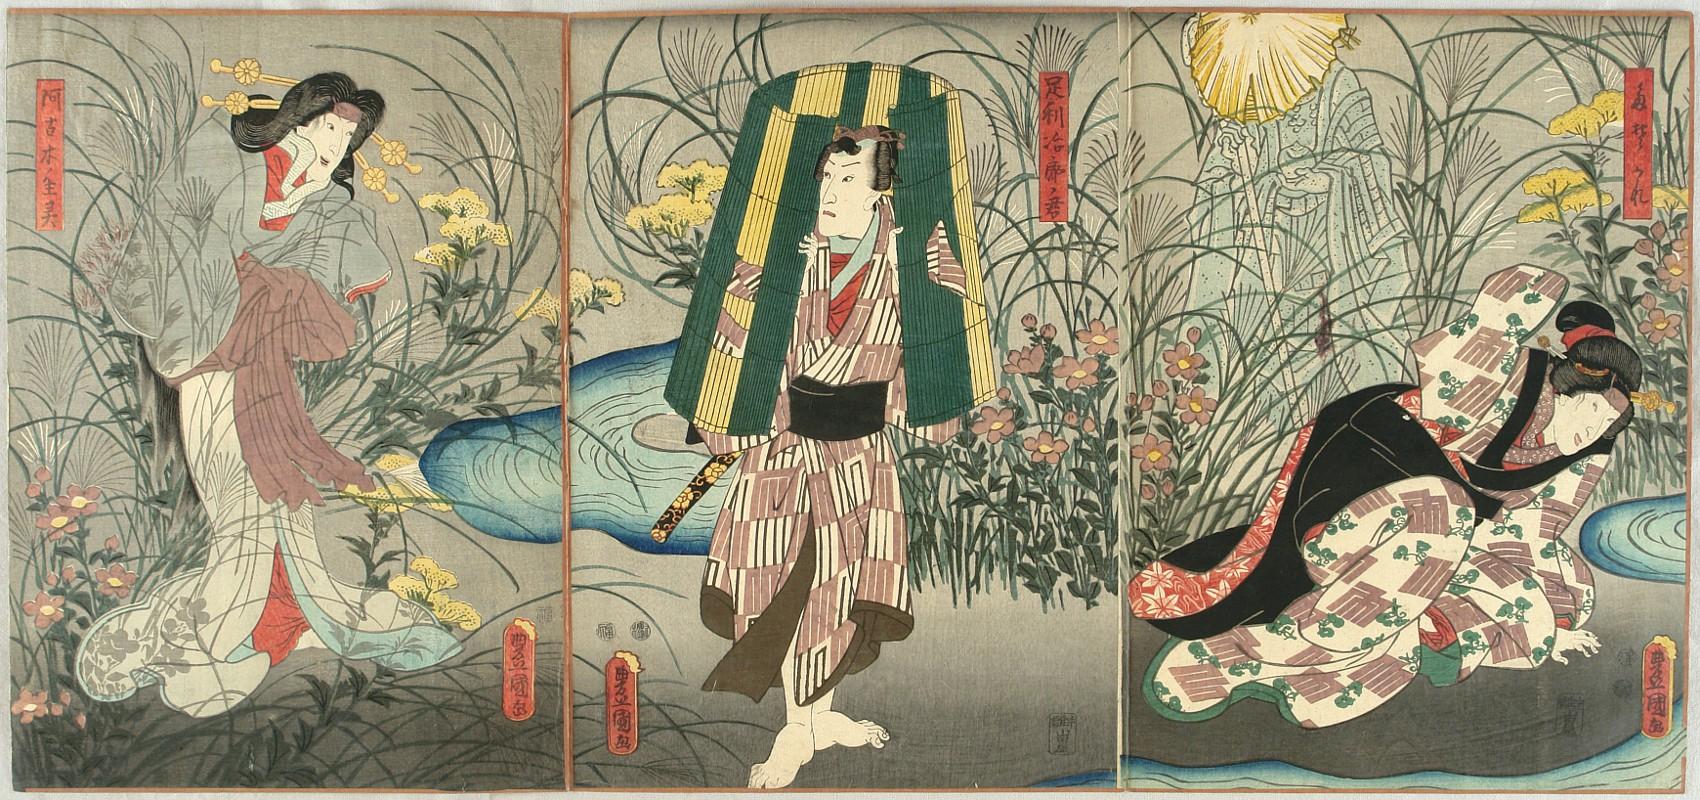 kunisada utagawa - biography and woodblock prints